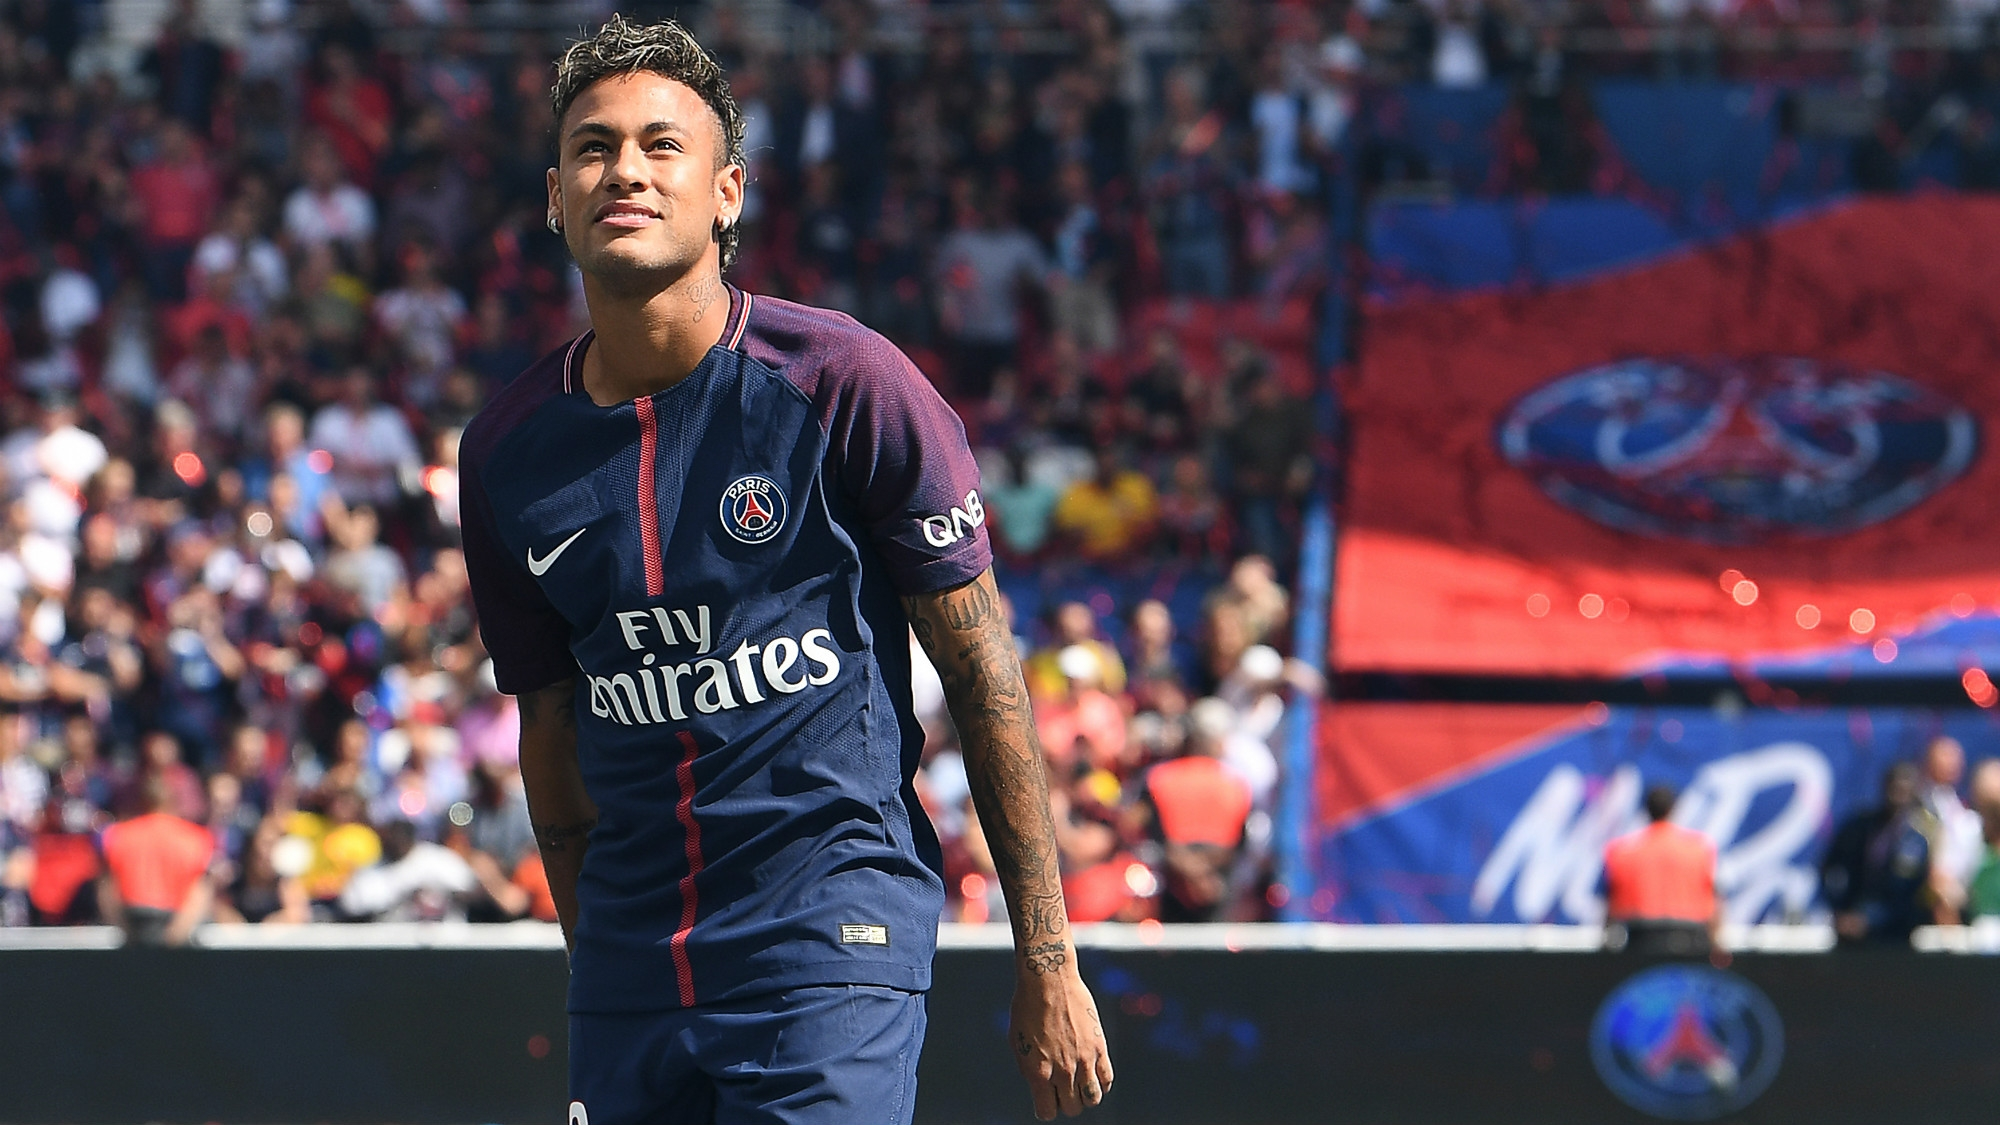 PSG Siapkan Bonus Rp 47 M jika Neymar Raih Ballon dOr